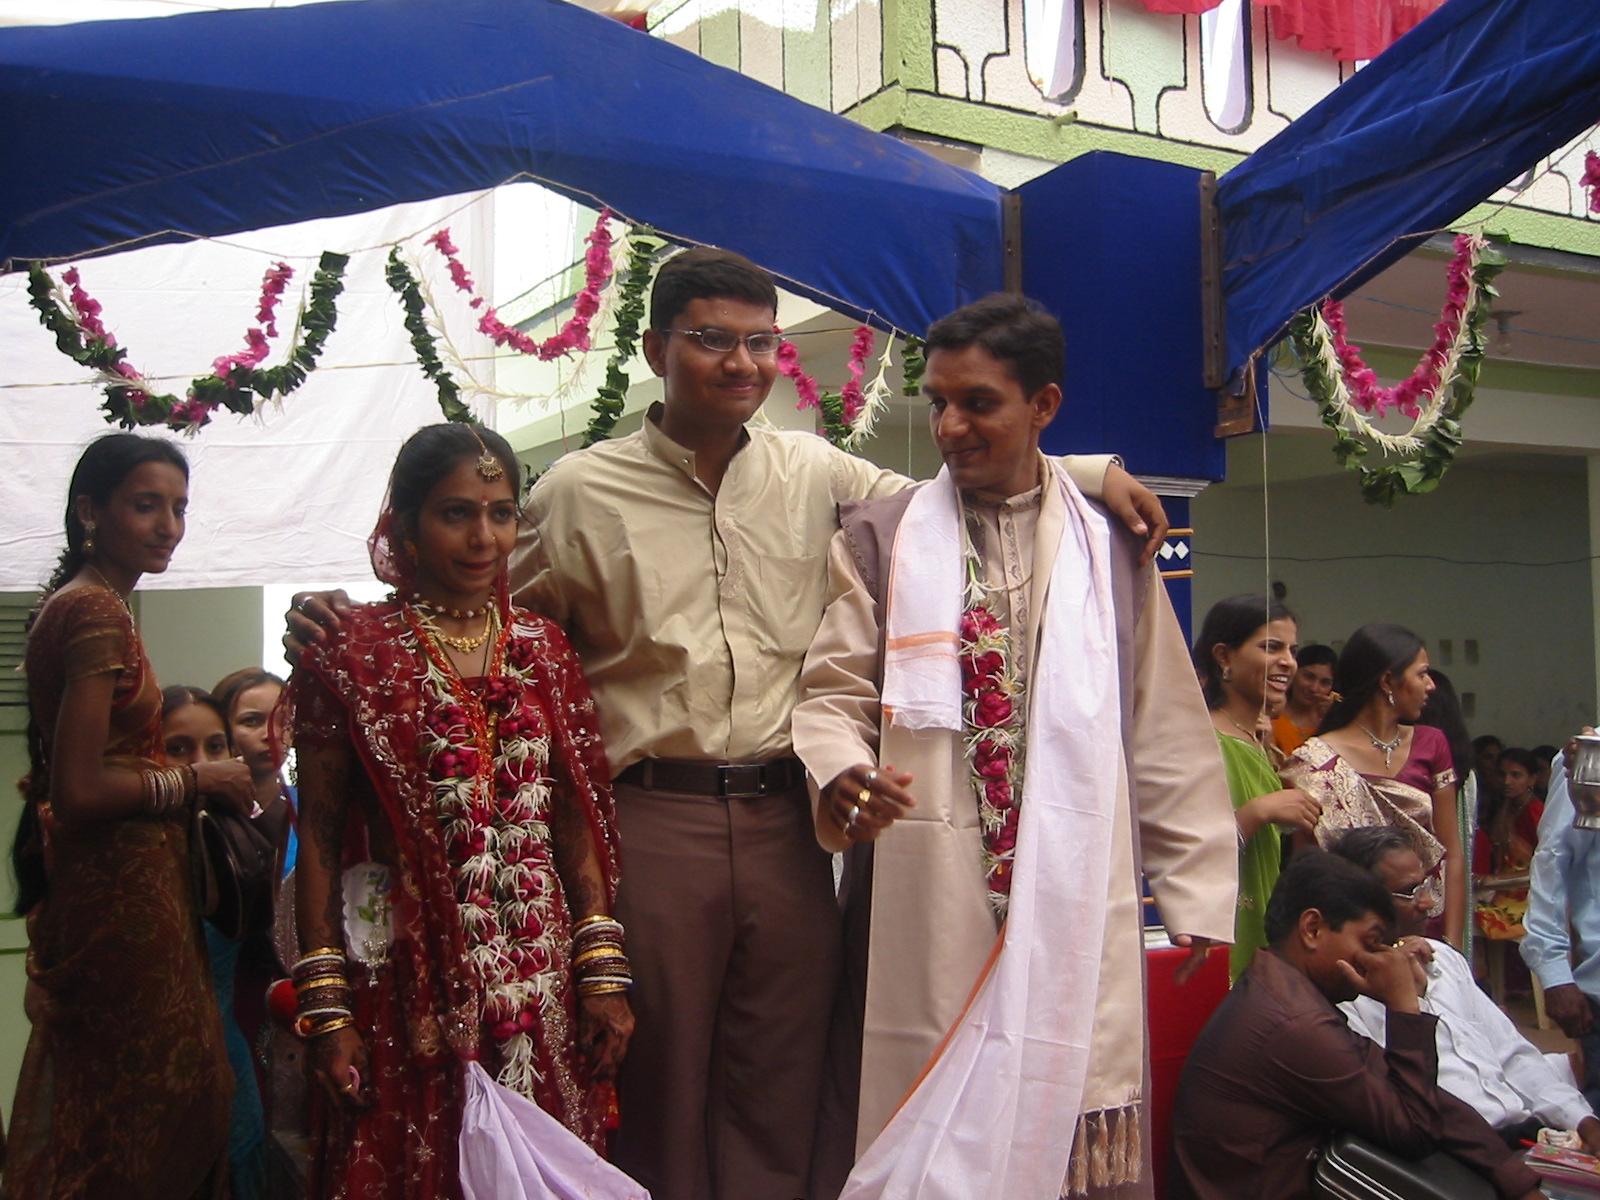 marriage photos indian wedding EoZ0EvM9